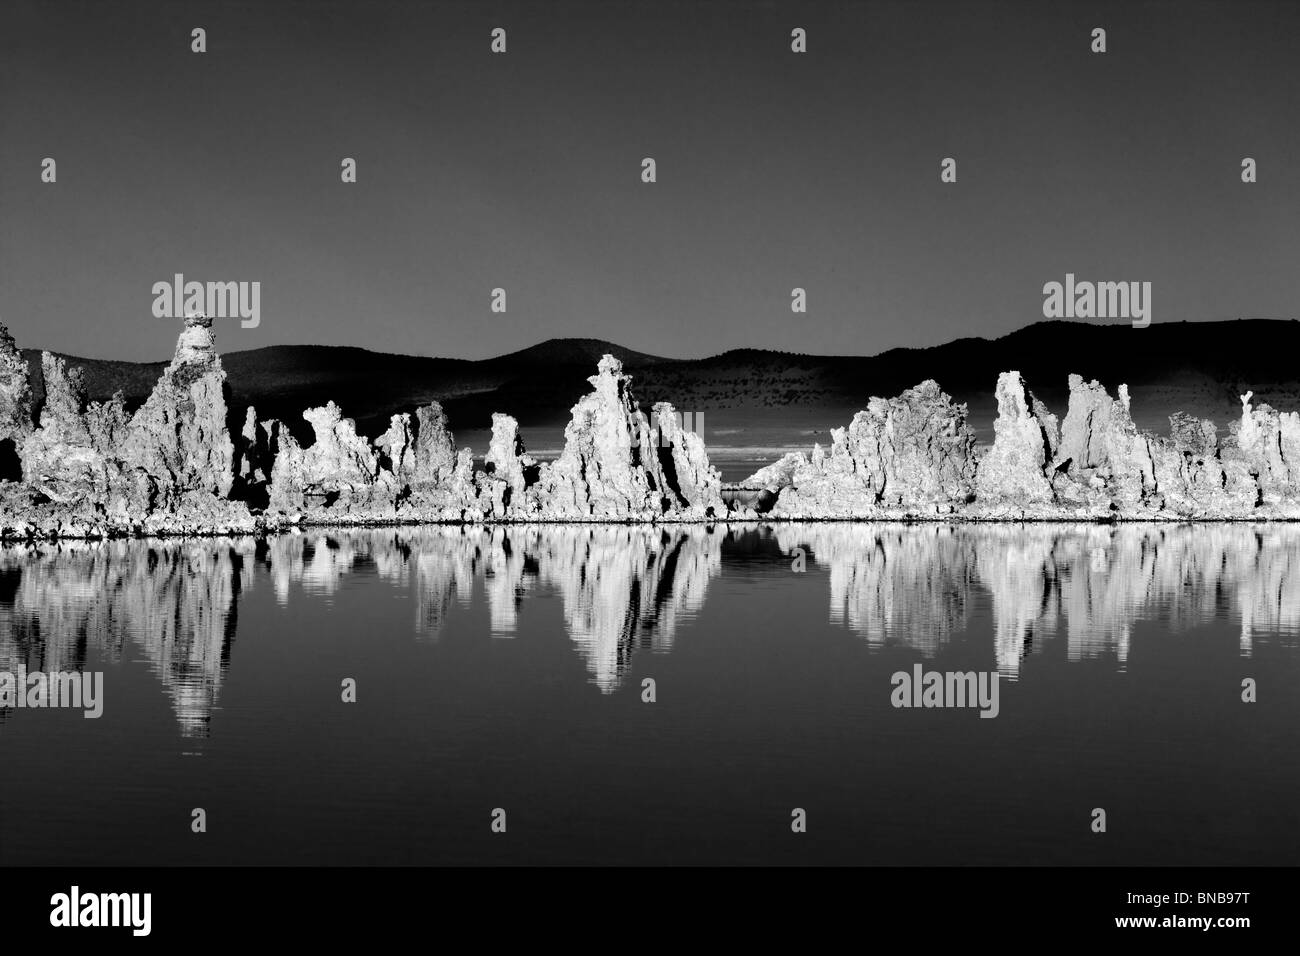 Tufa and reflections in Mono Lake, California - Stock Image